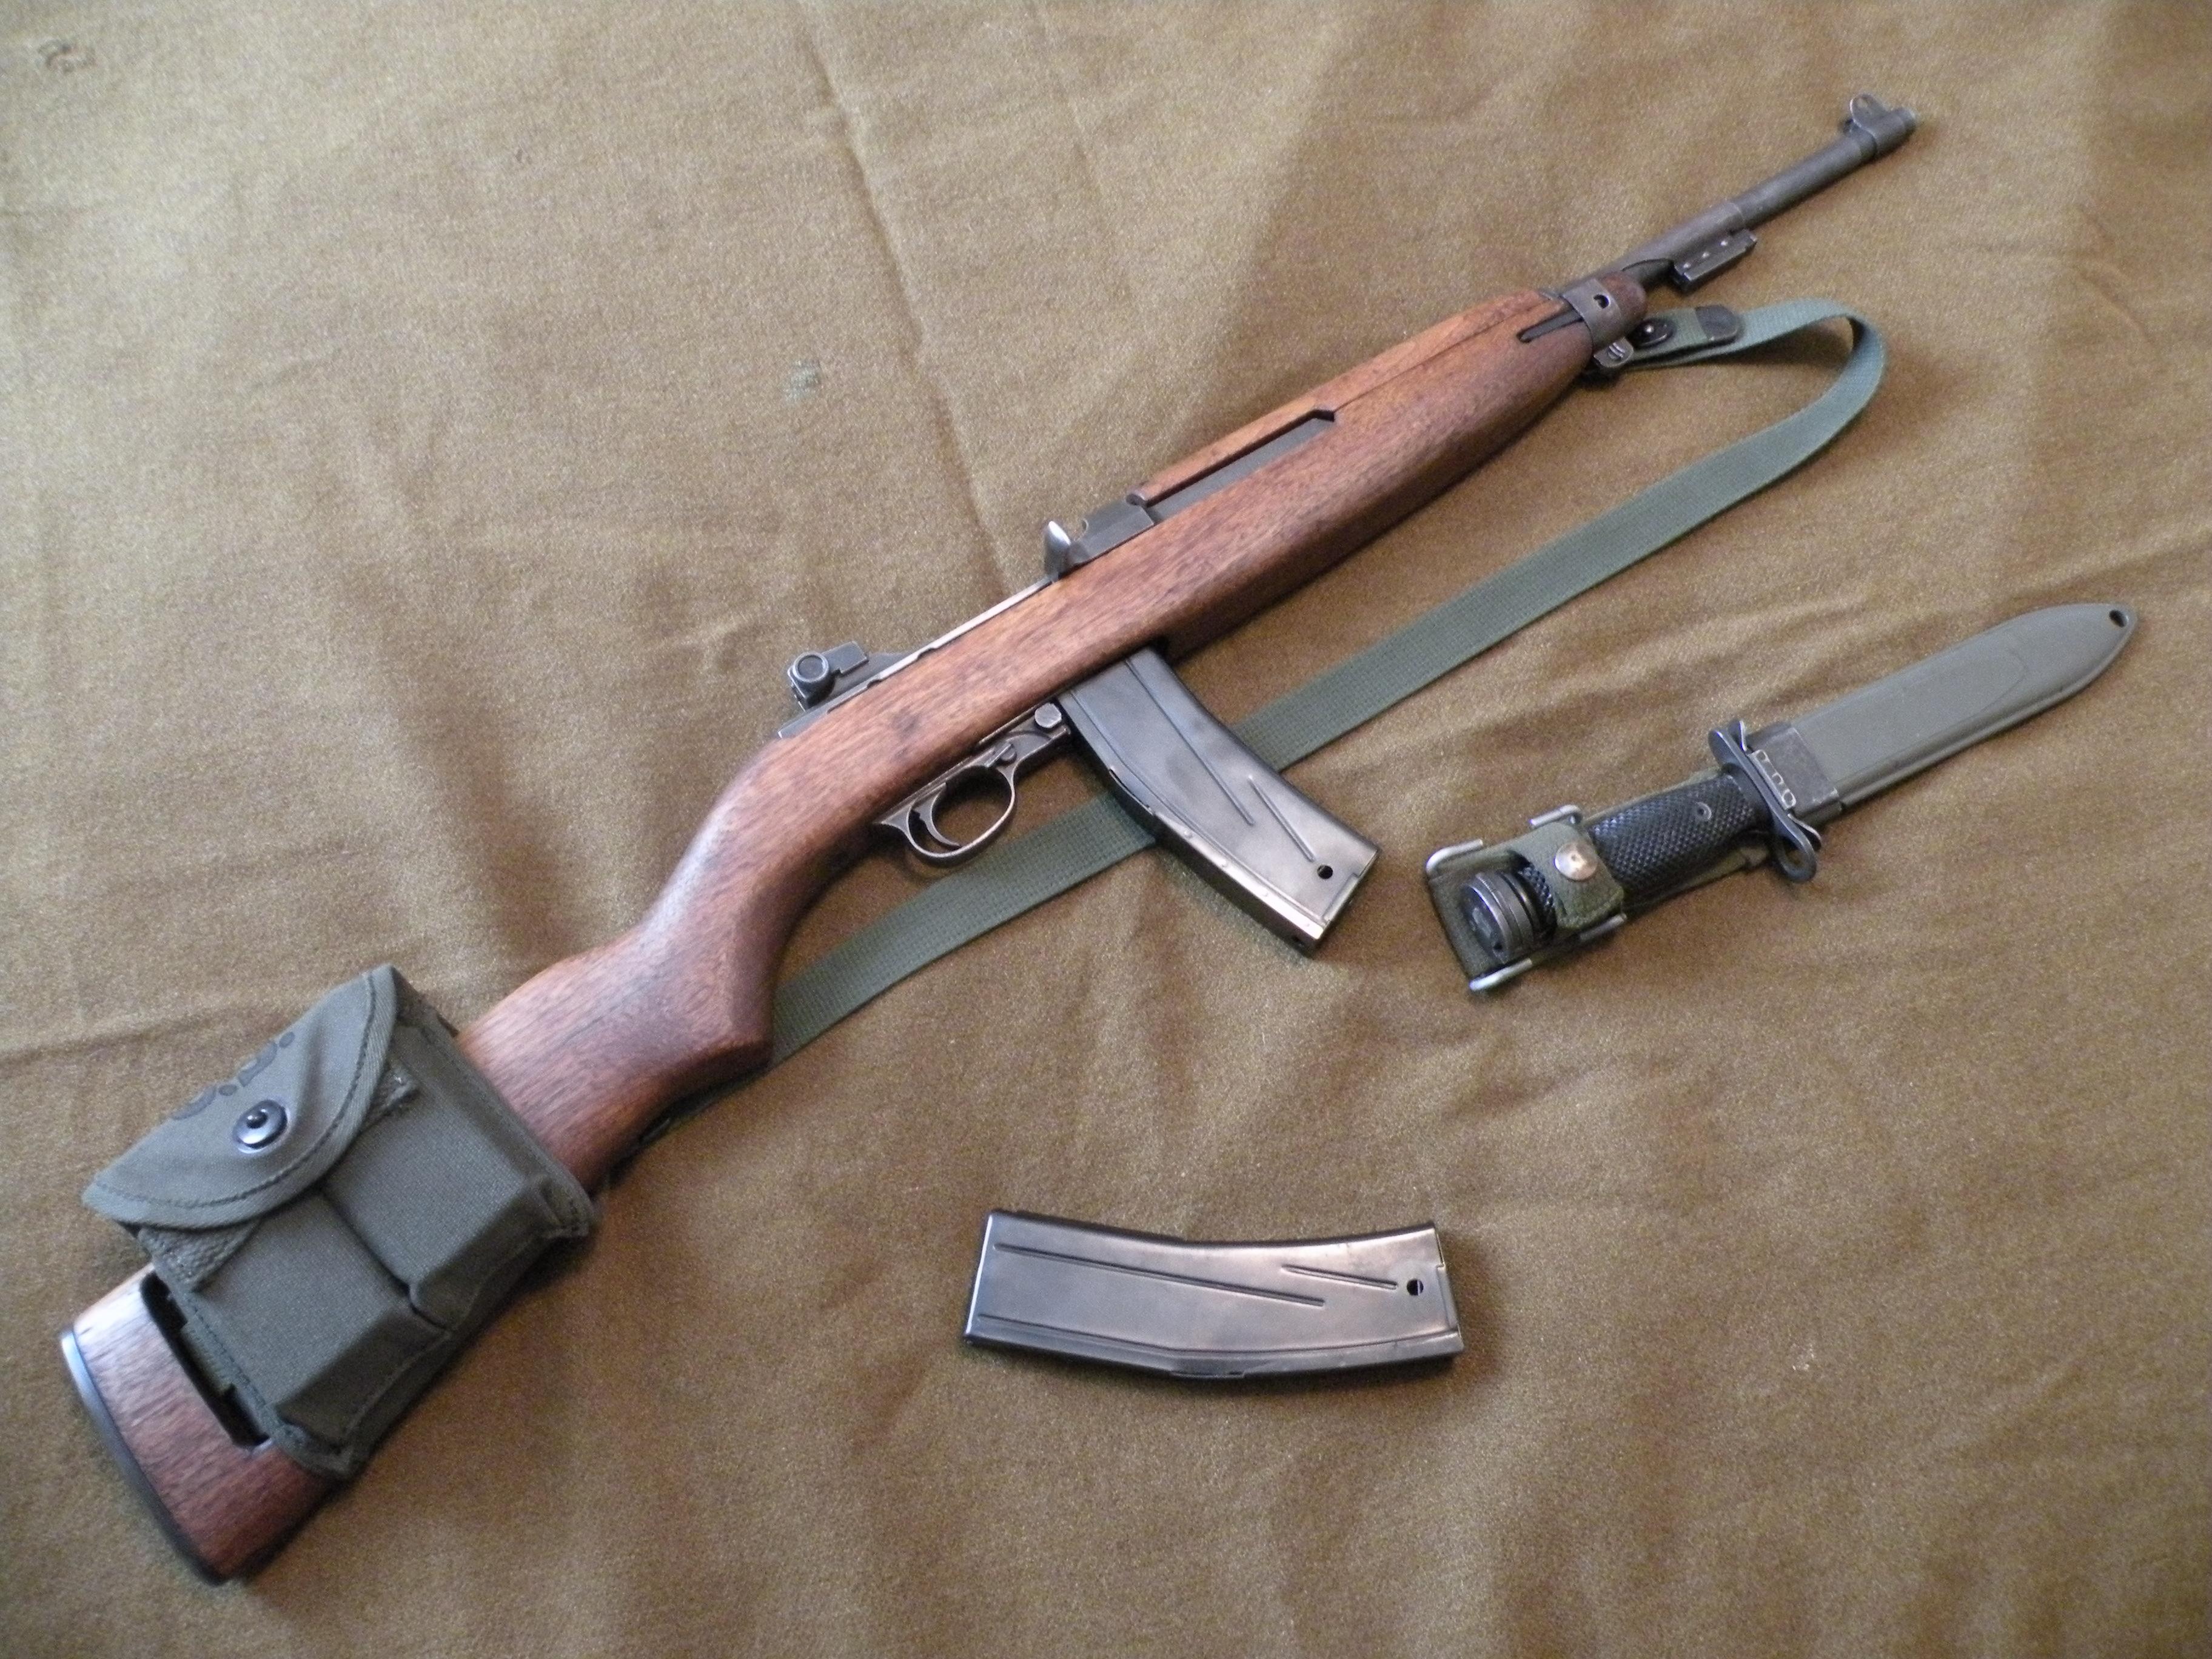 M1: M1 Carbine For SHTF